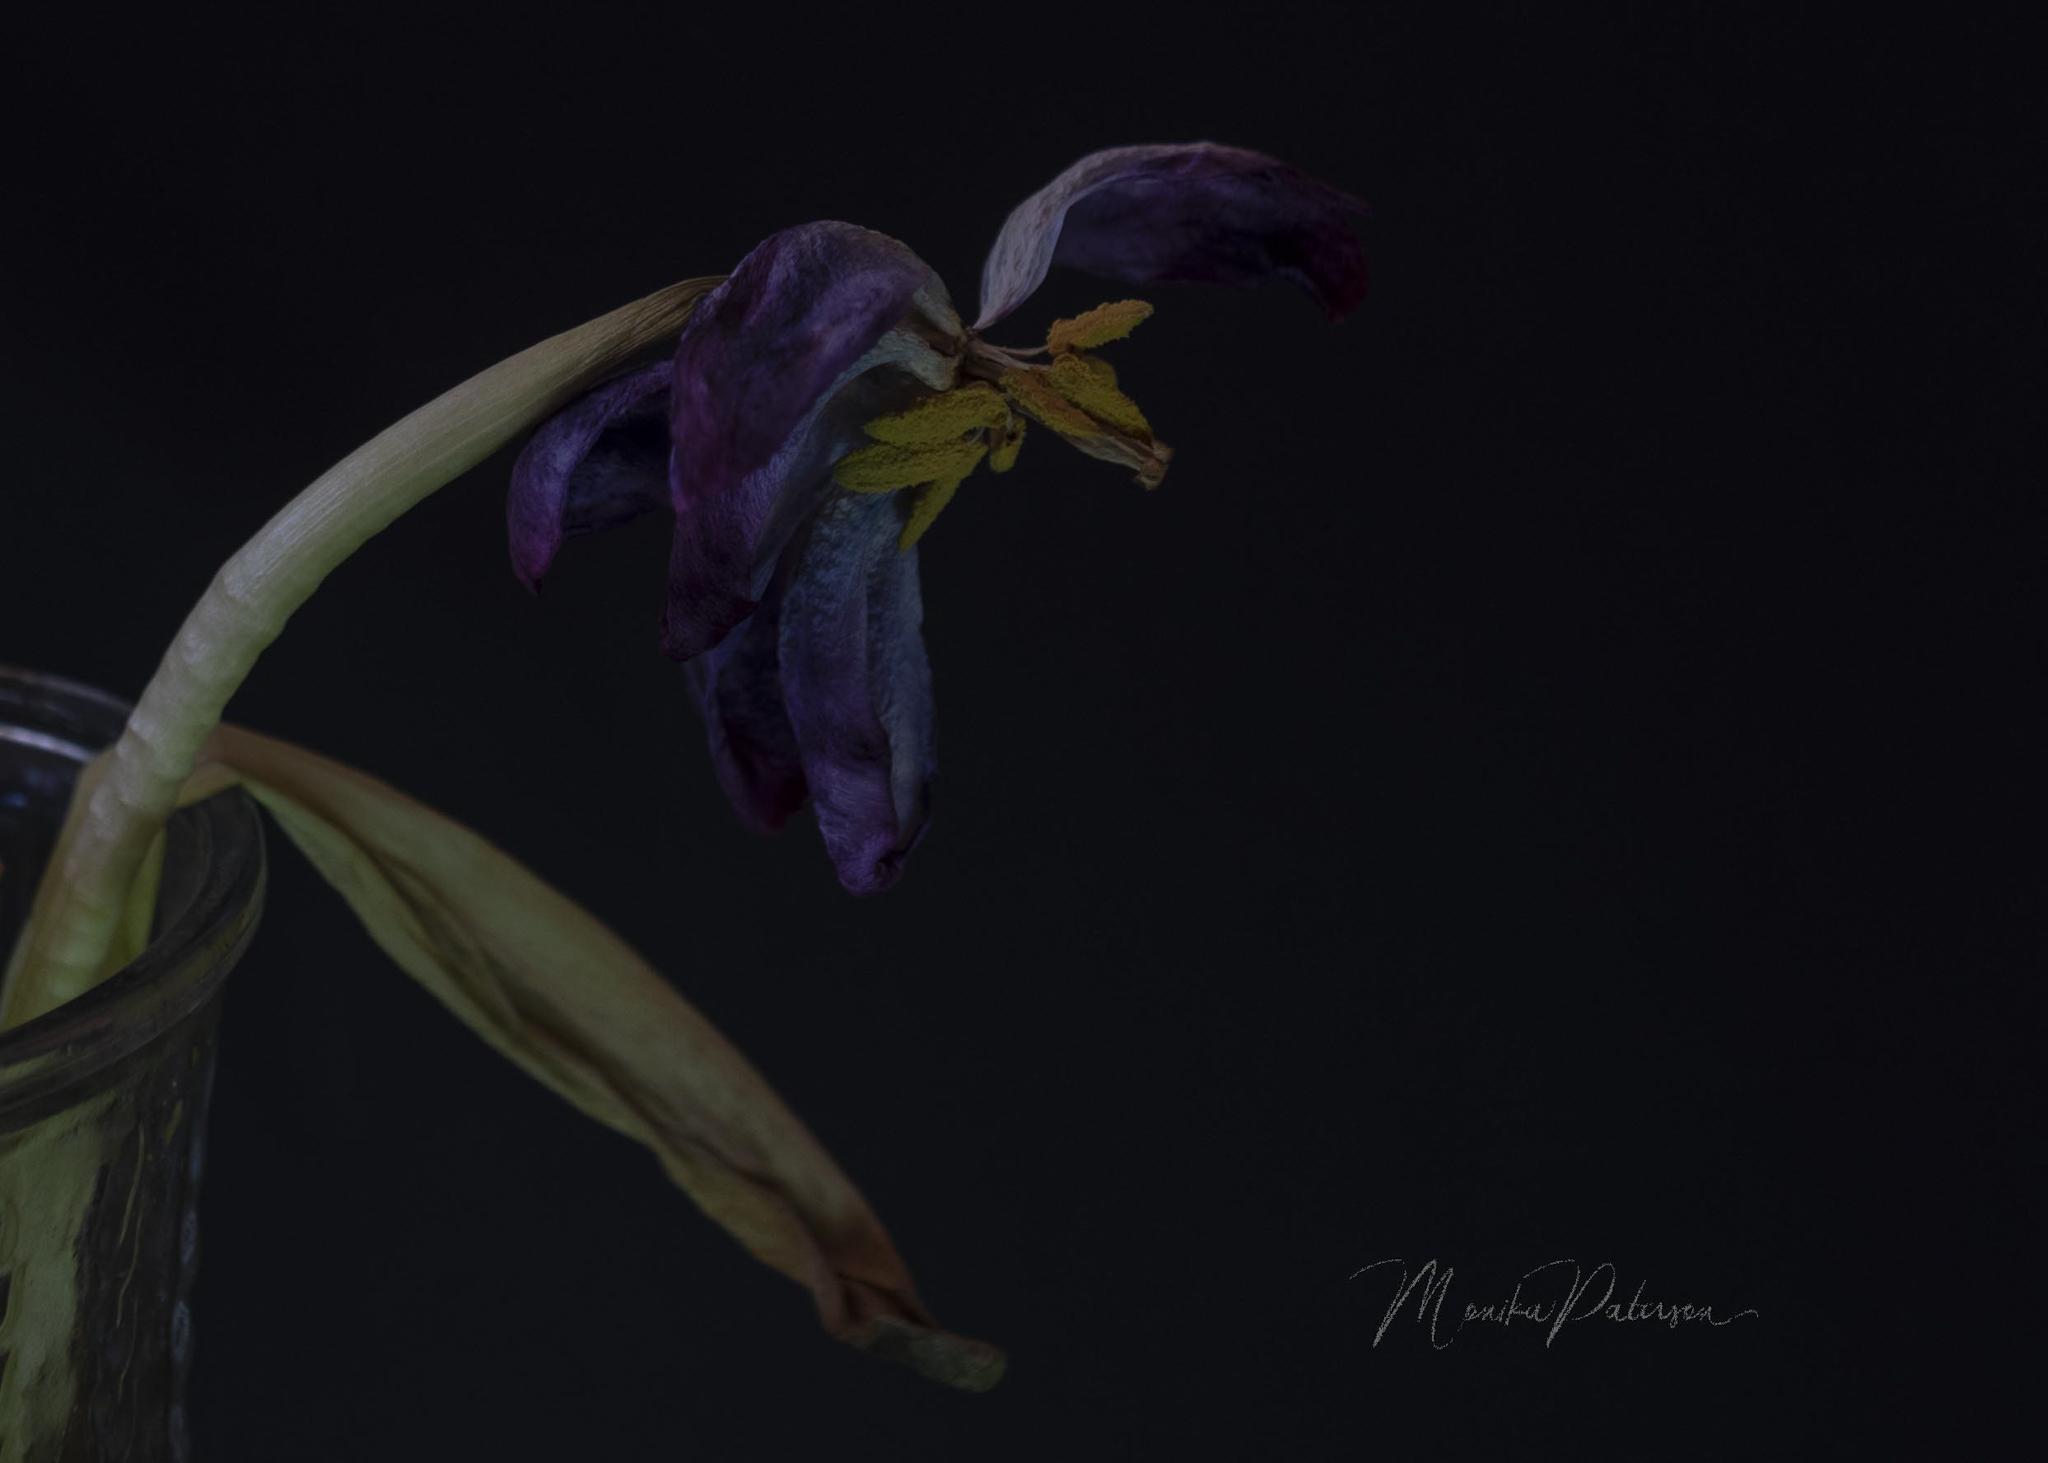 Monika Paterson_MP7_2625 dry purple tulip edit sm wm- Small